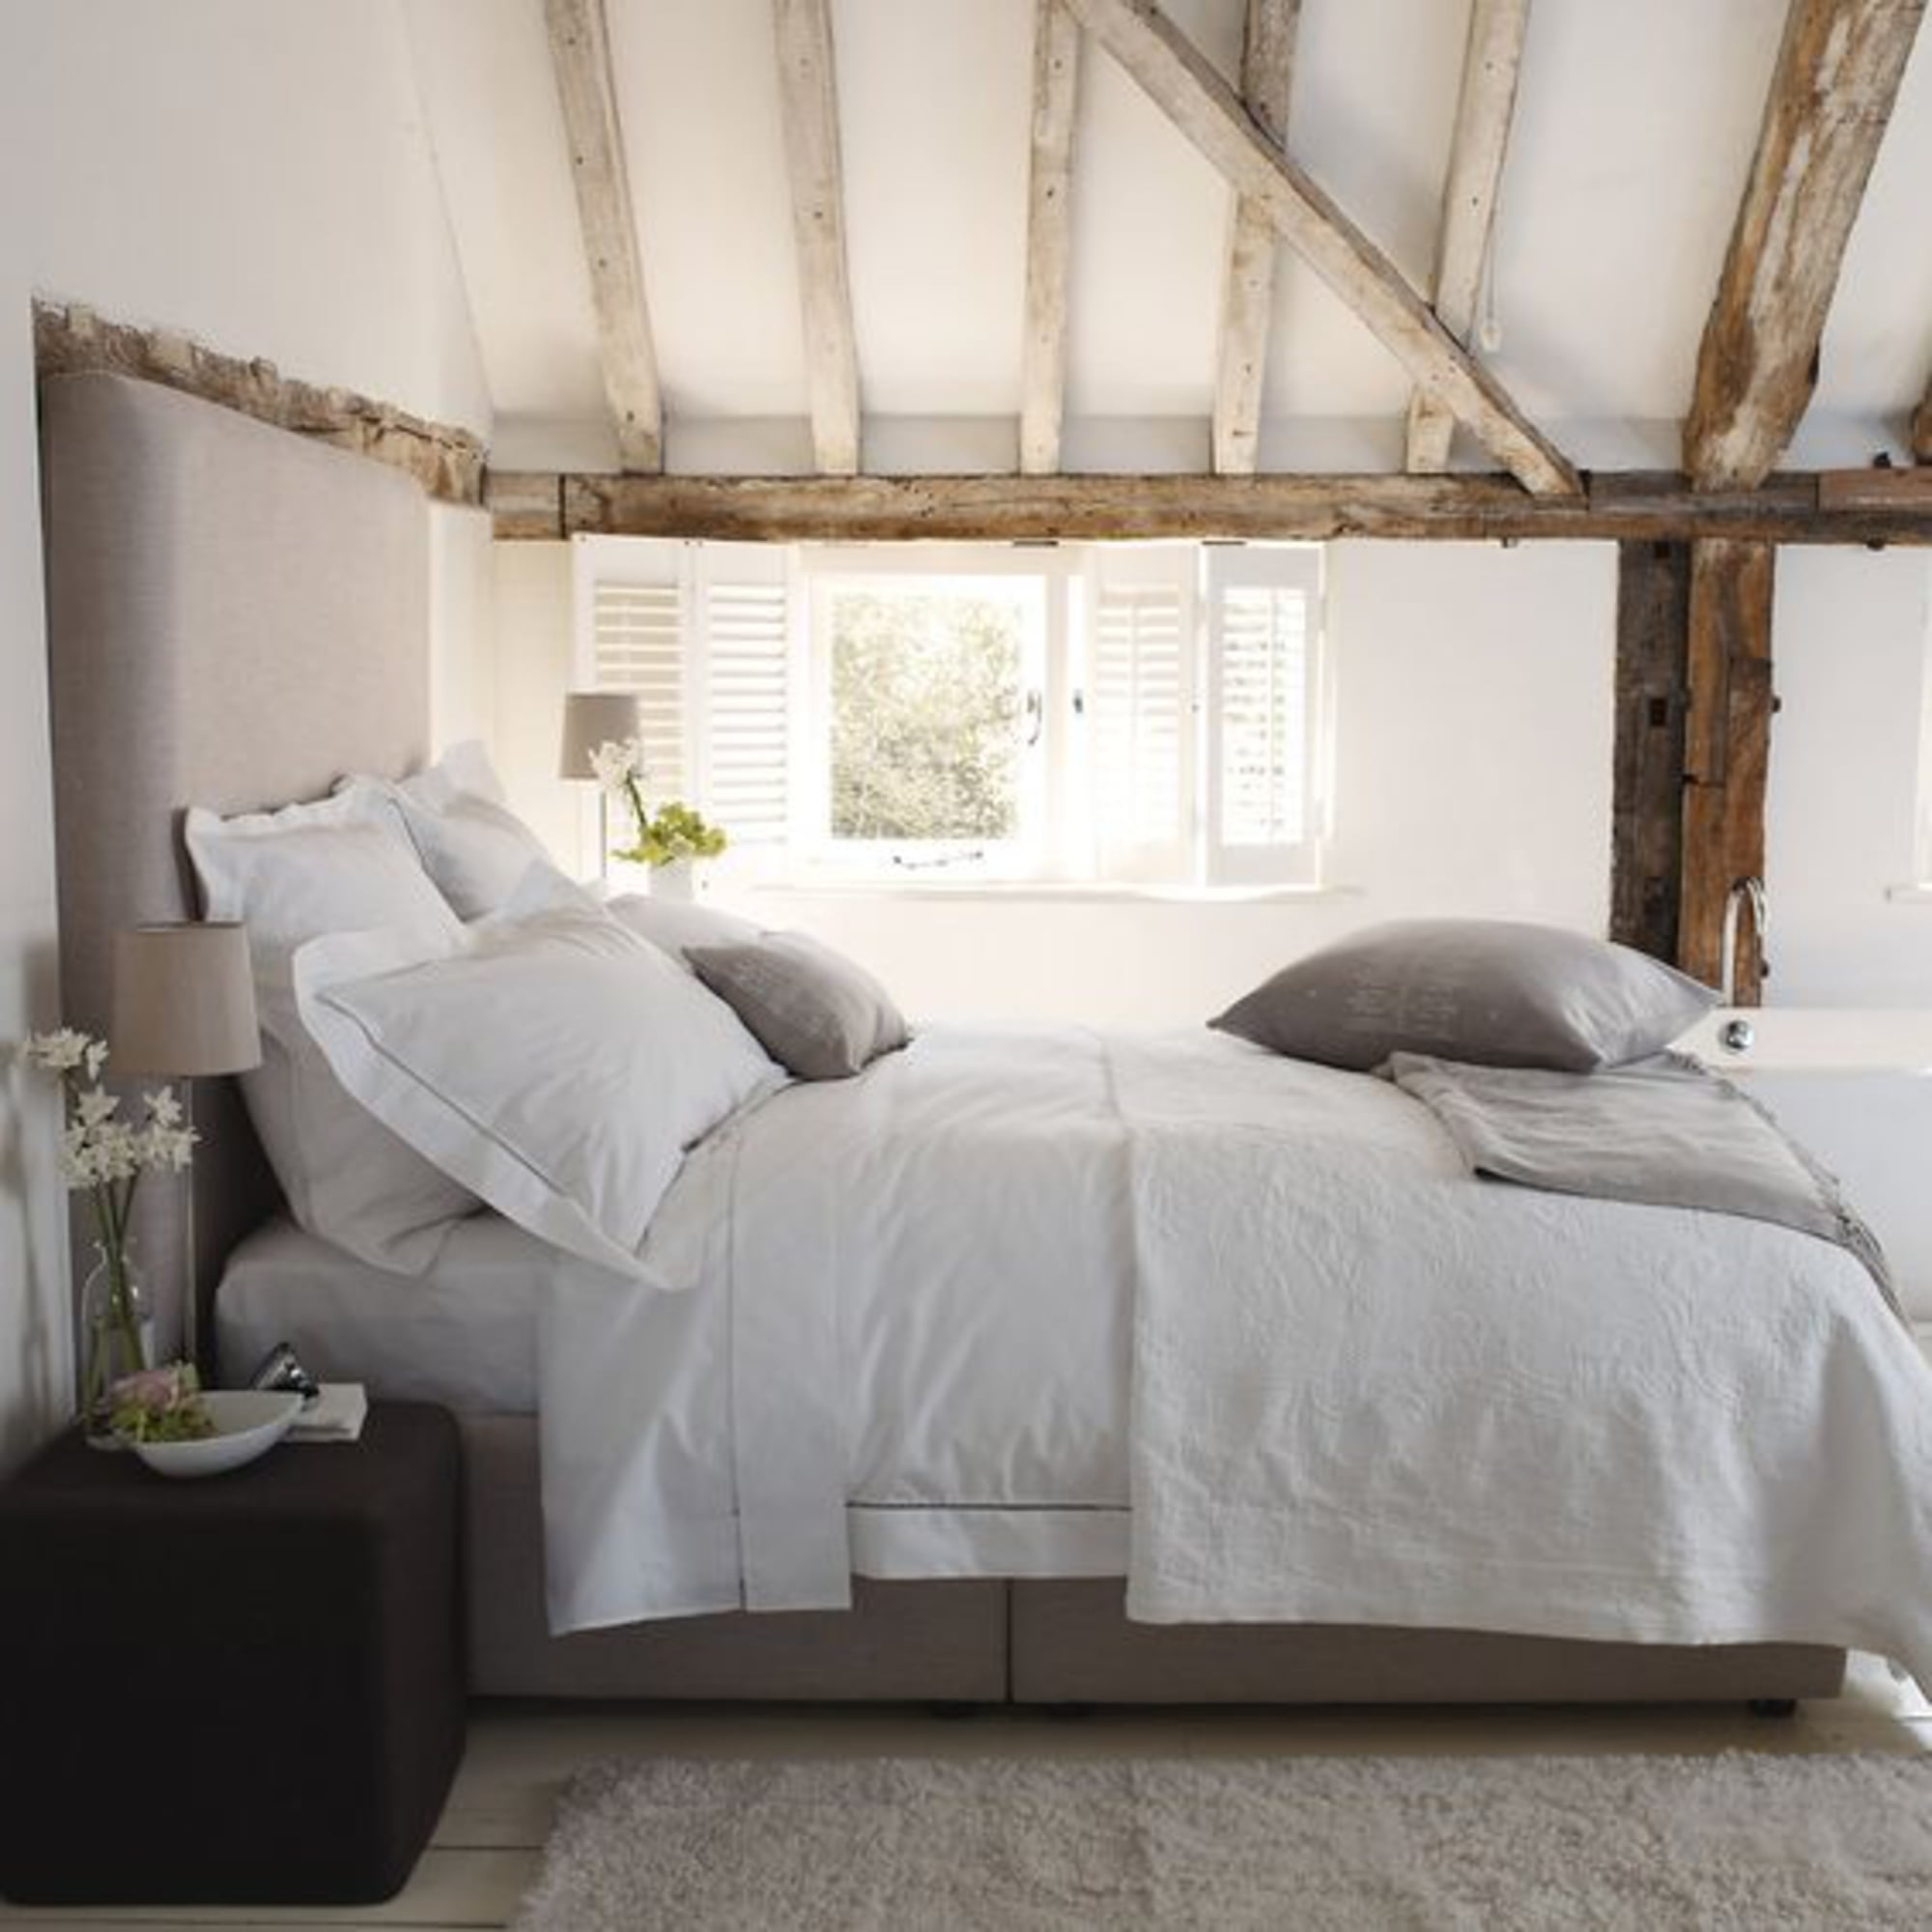 About white 1000tc egyptian cotton complete bedding collection sheet - 1000tc Luxury Egyptian Cotton Oxford Pillow Case Dorchester